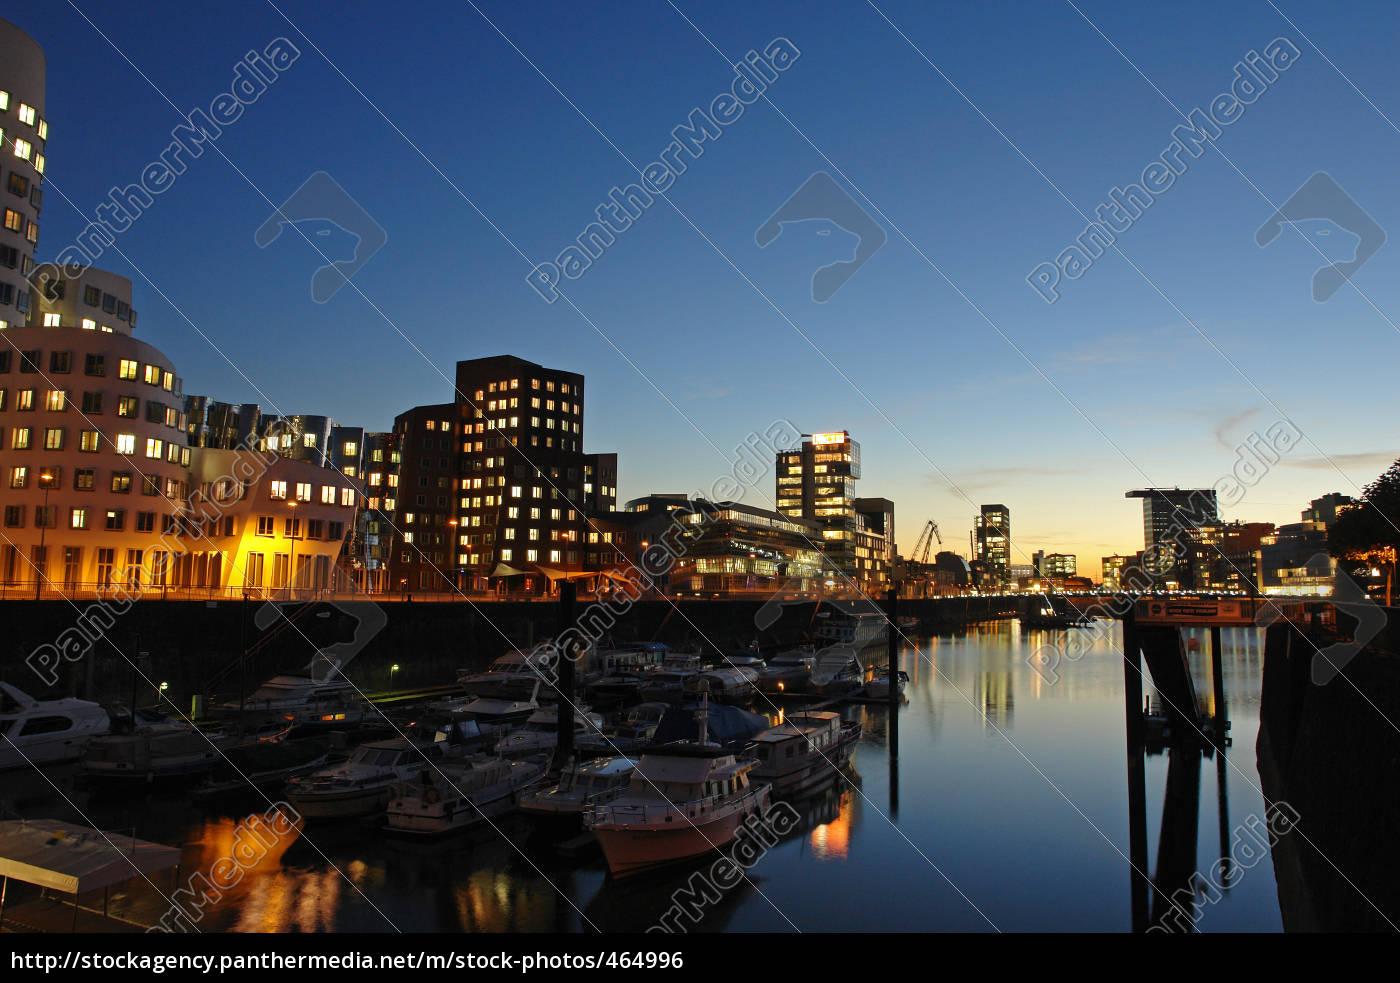 düsseldorf, media, harbour - 464996